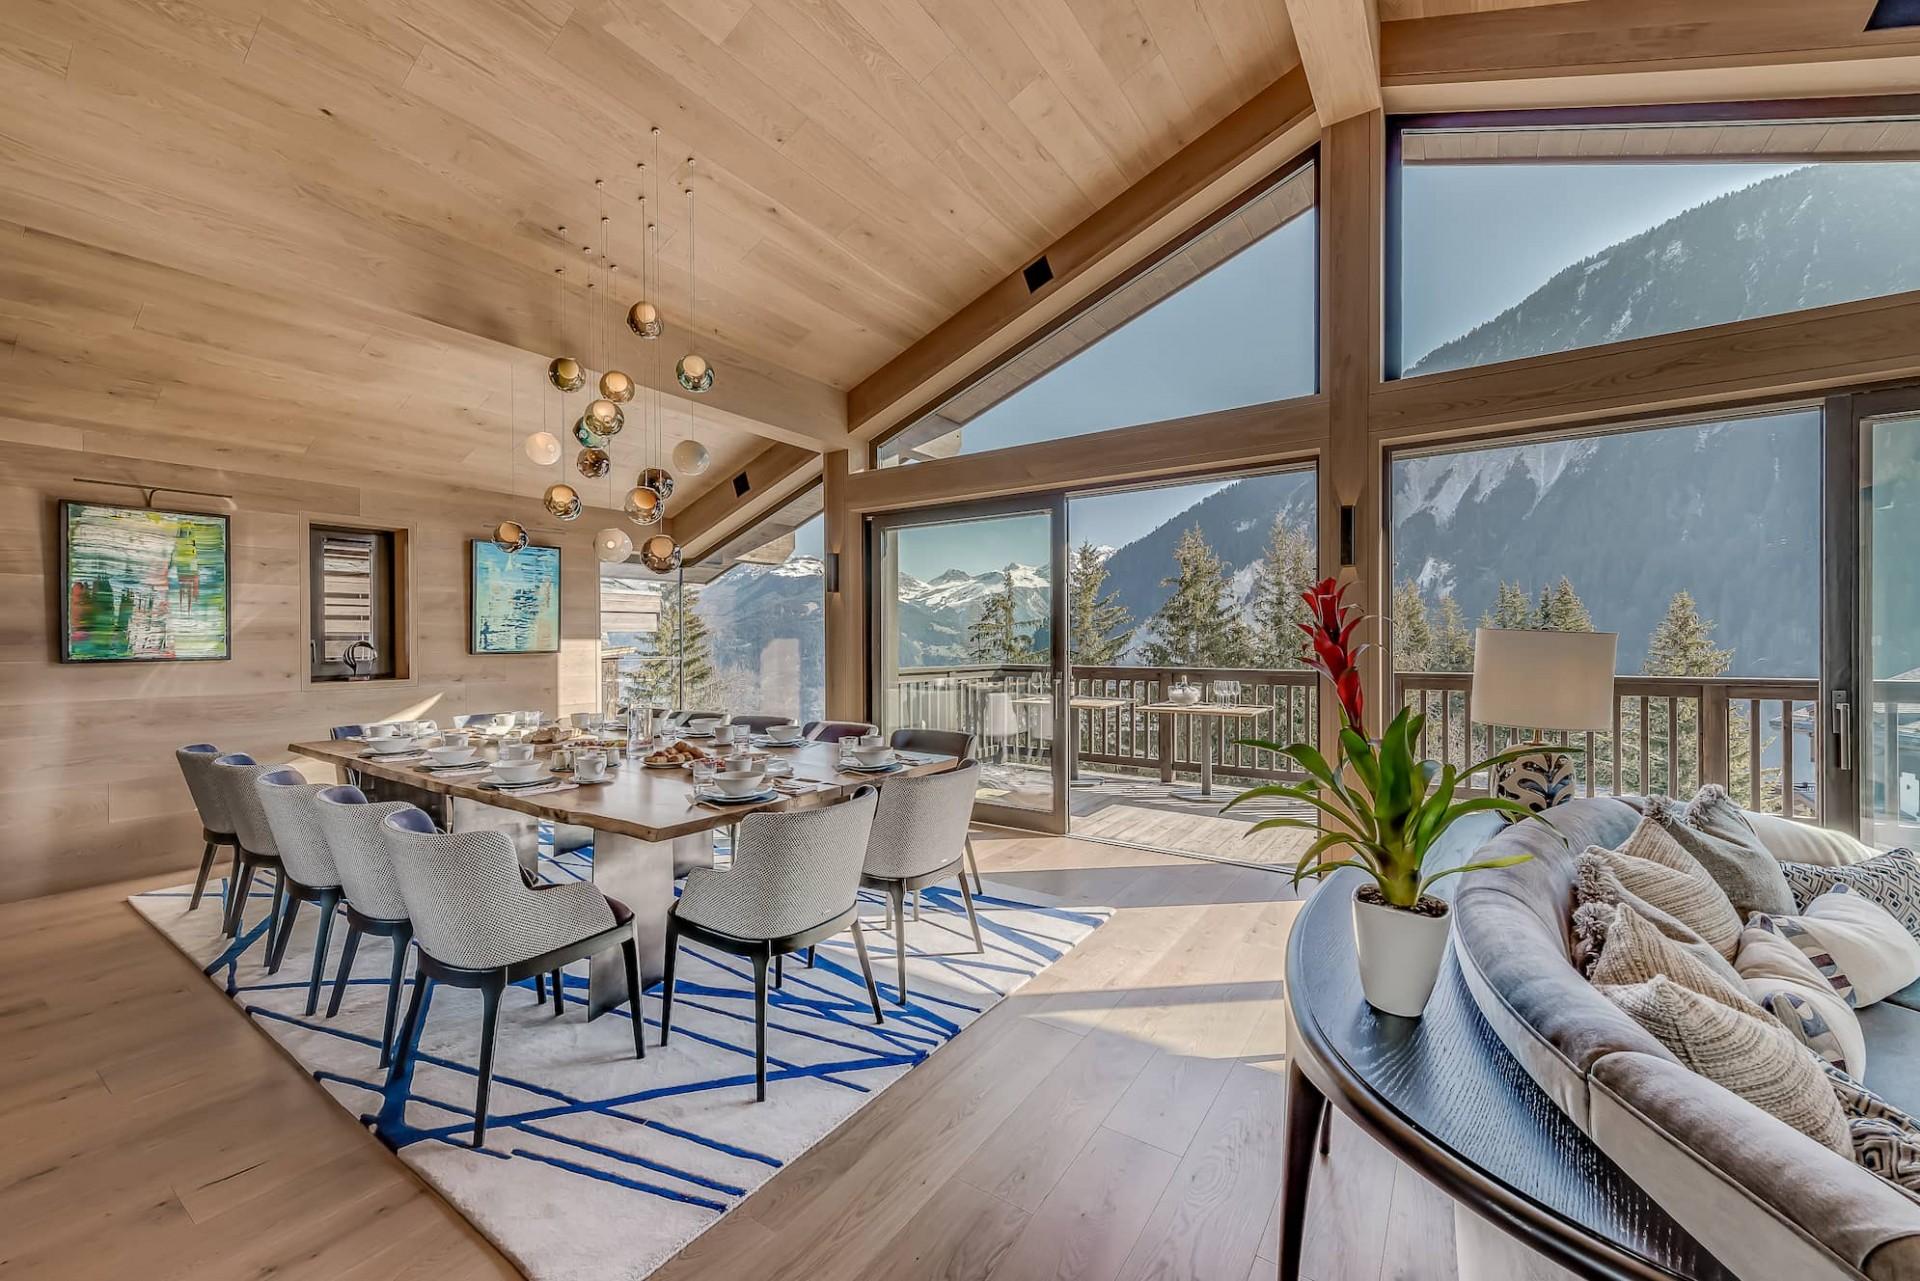 Courchevel 1650 Luxury Rental Chalet Elana Dining Room